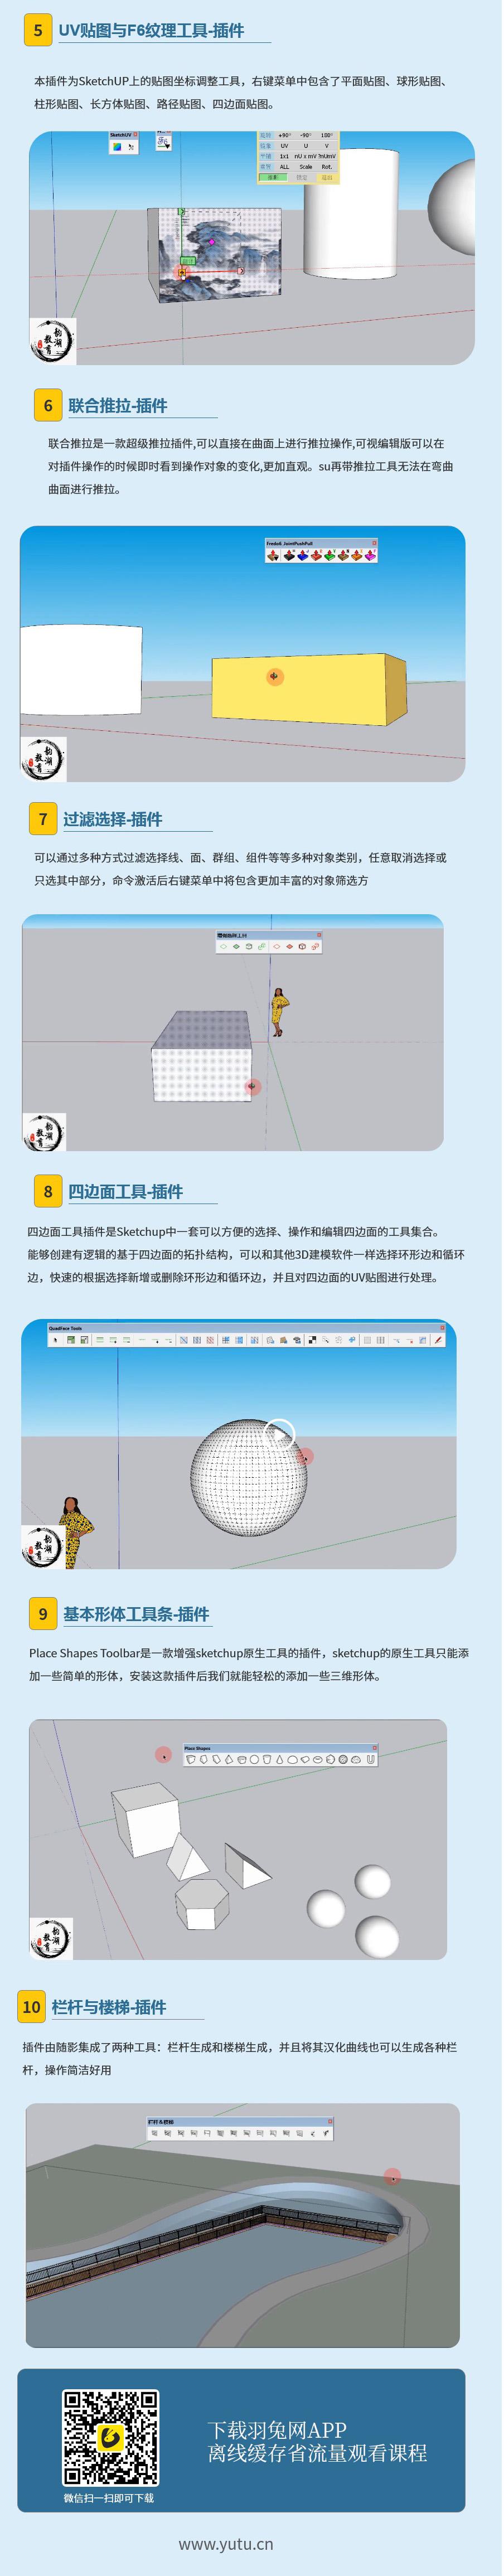 Sketchup2021插件使用教程